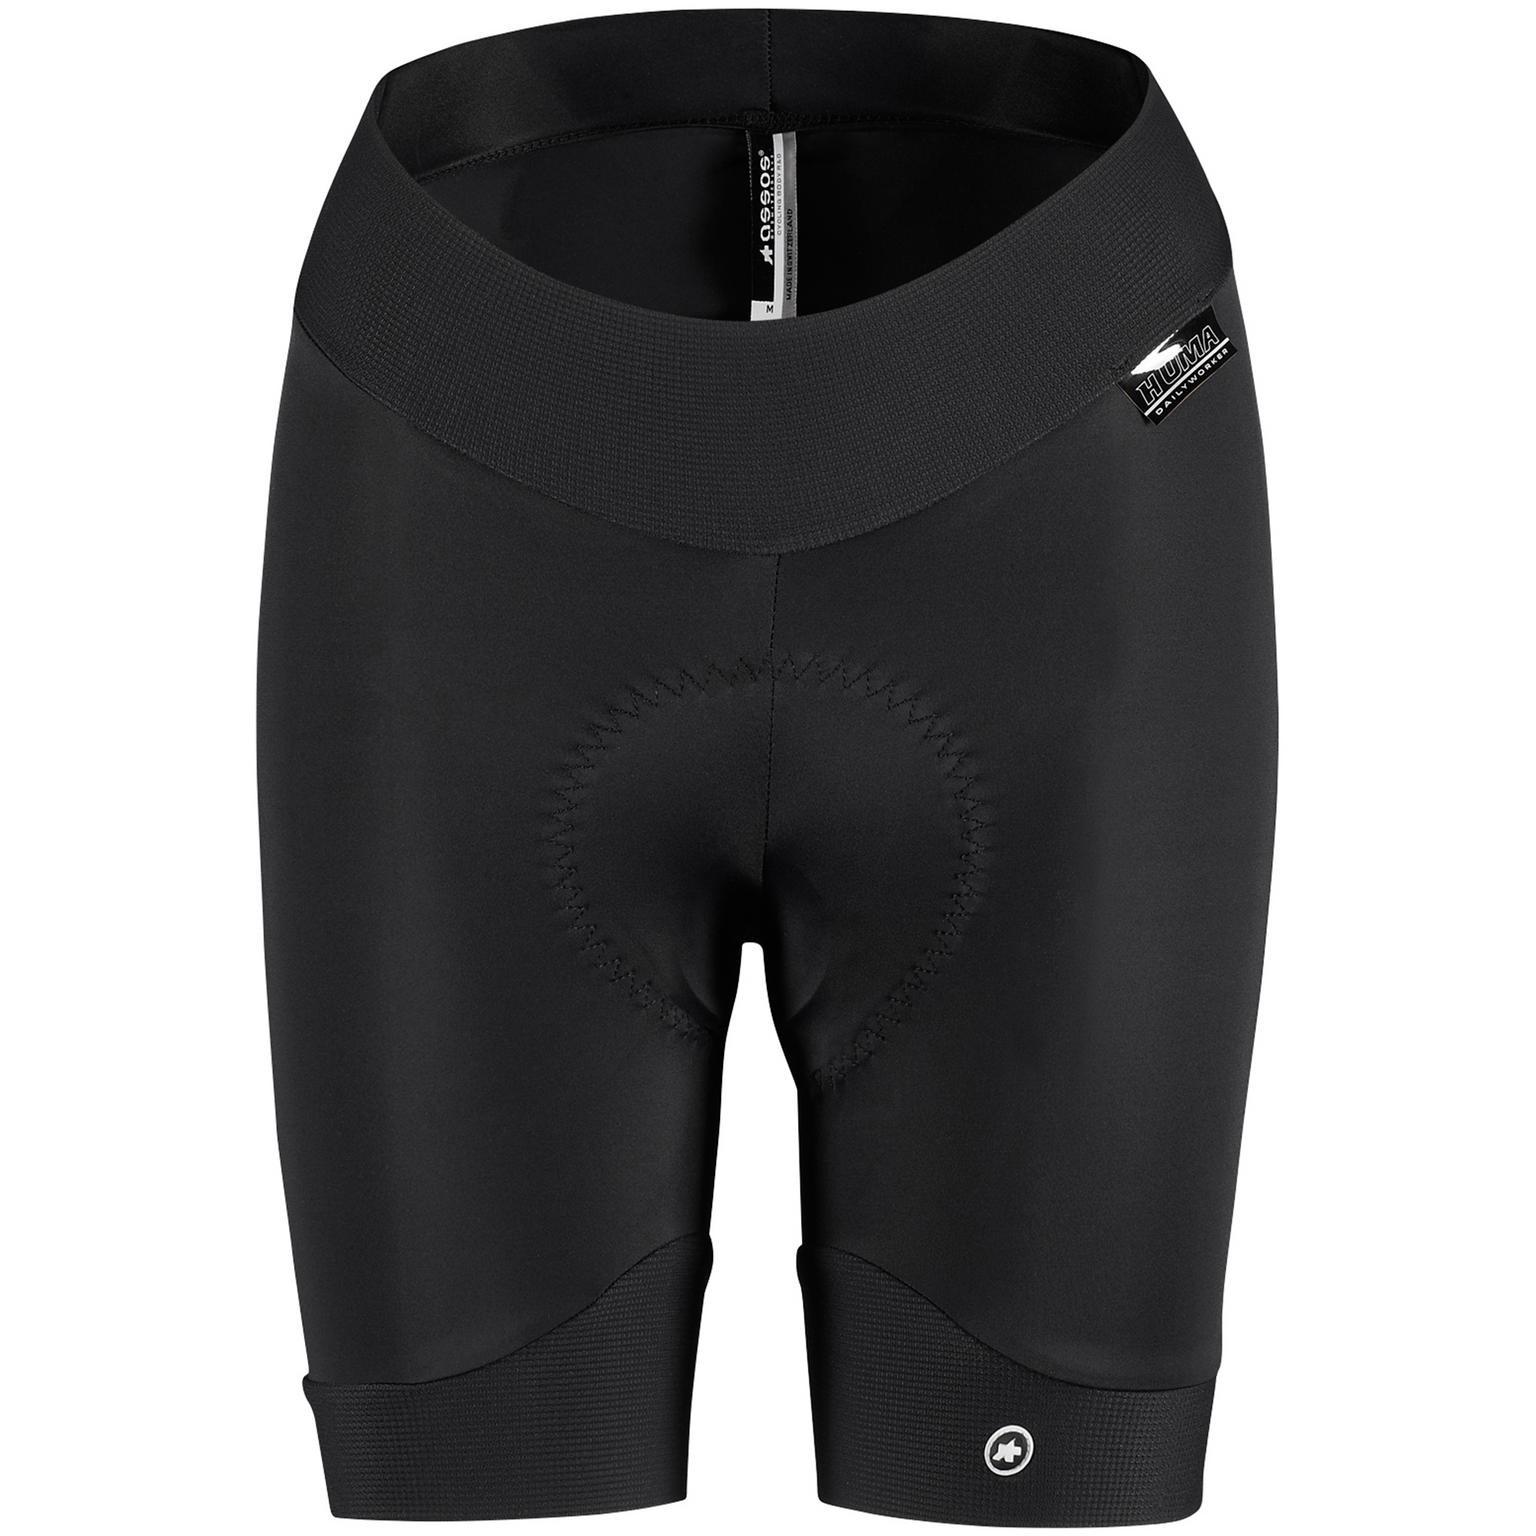 Uma GT 19, cykelbukser, korte, dame, Grå | Bukser